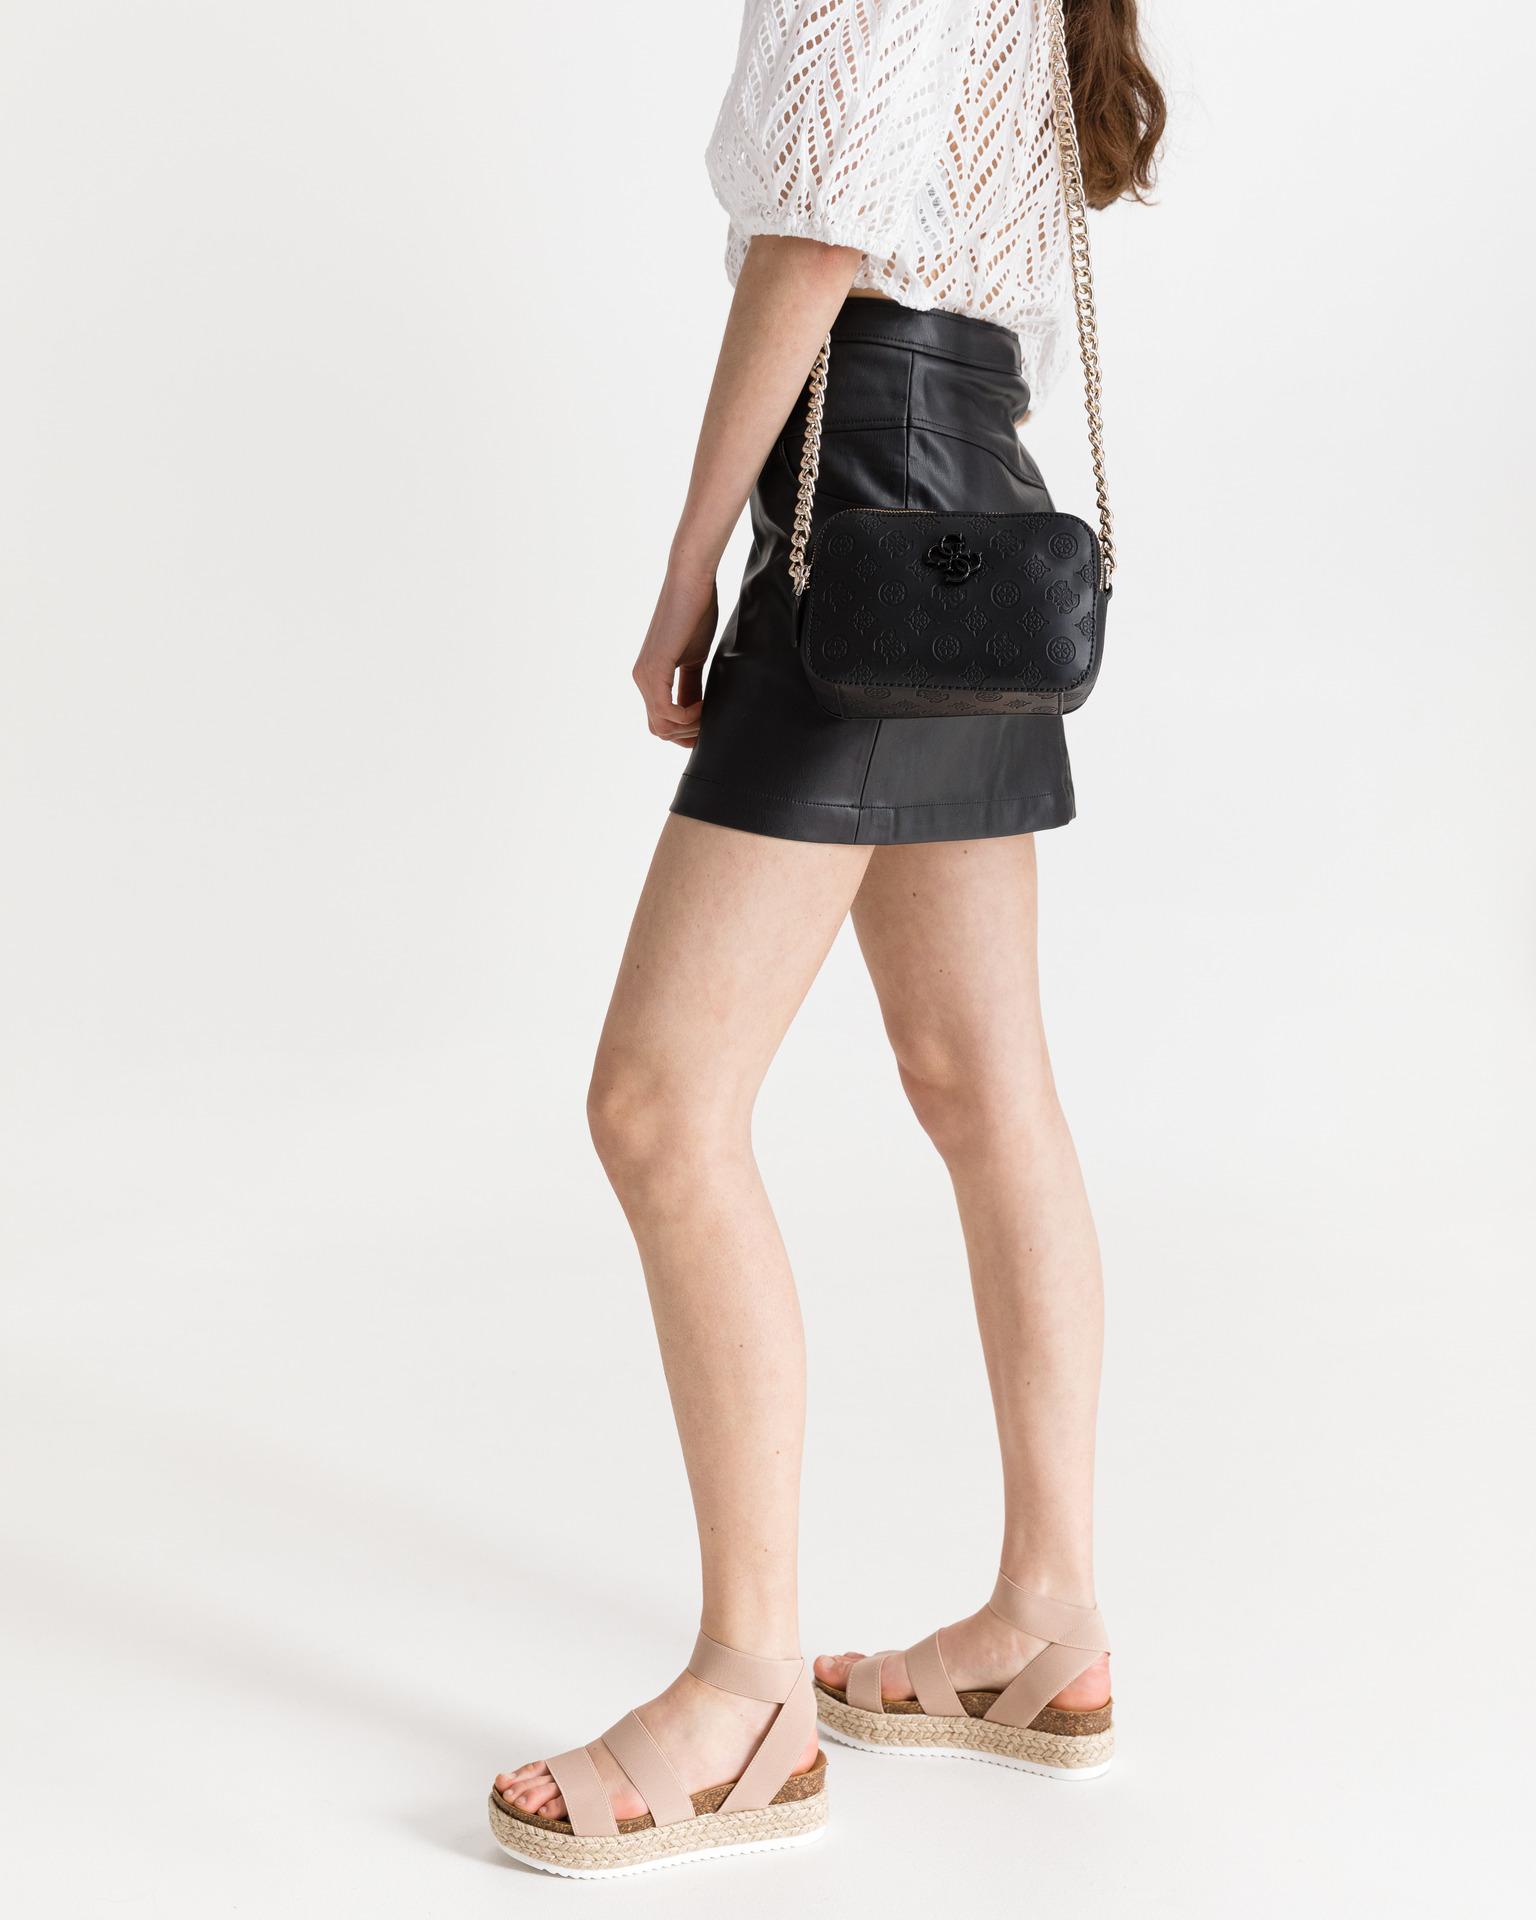 Guess black crossbody handbag Noelle